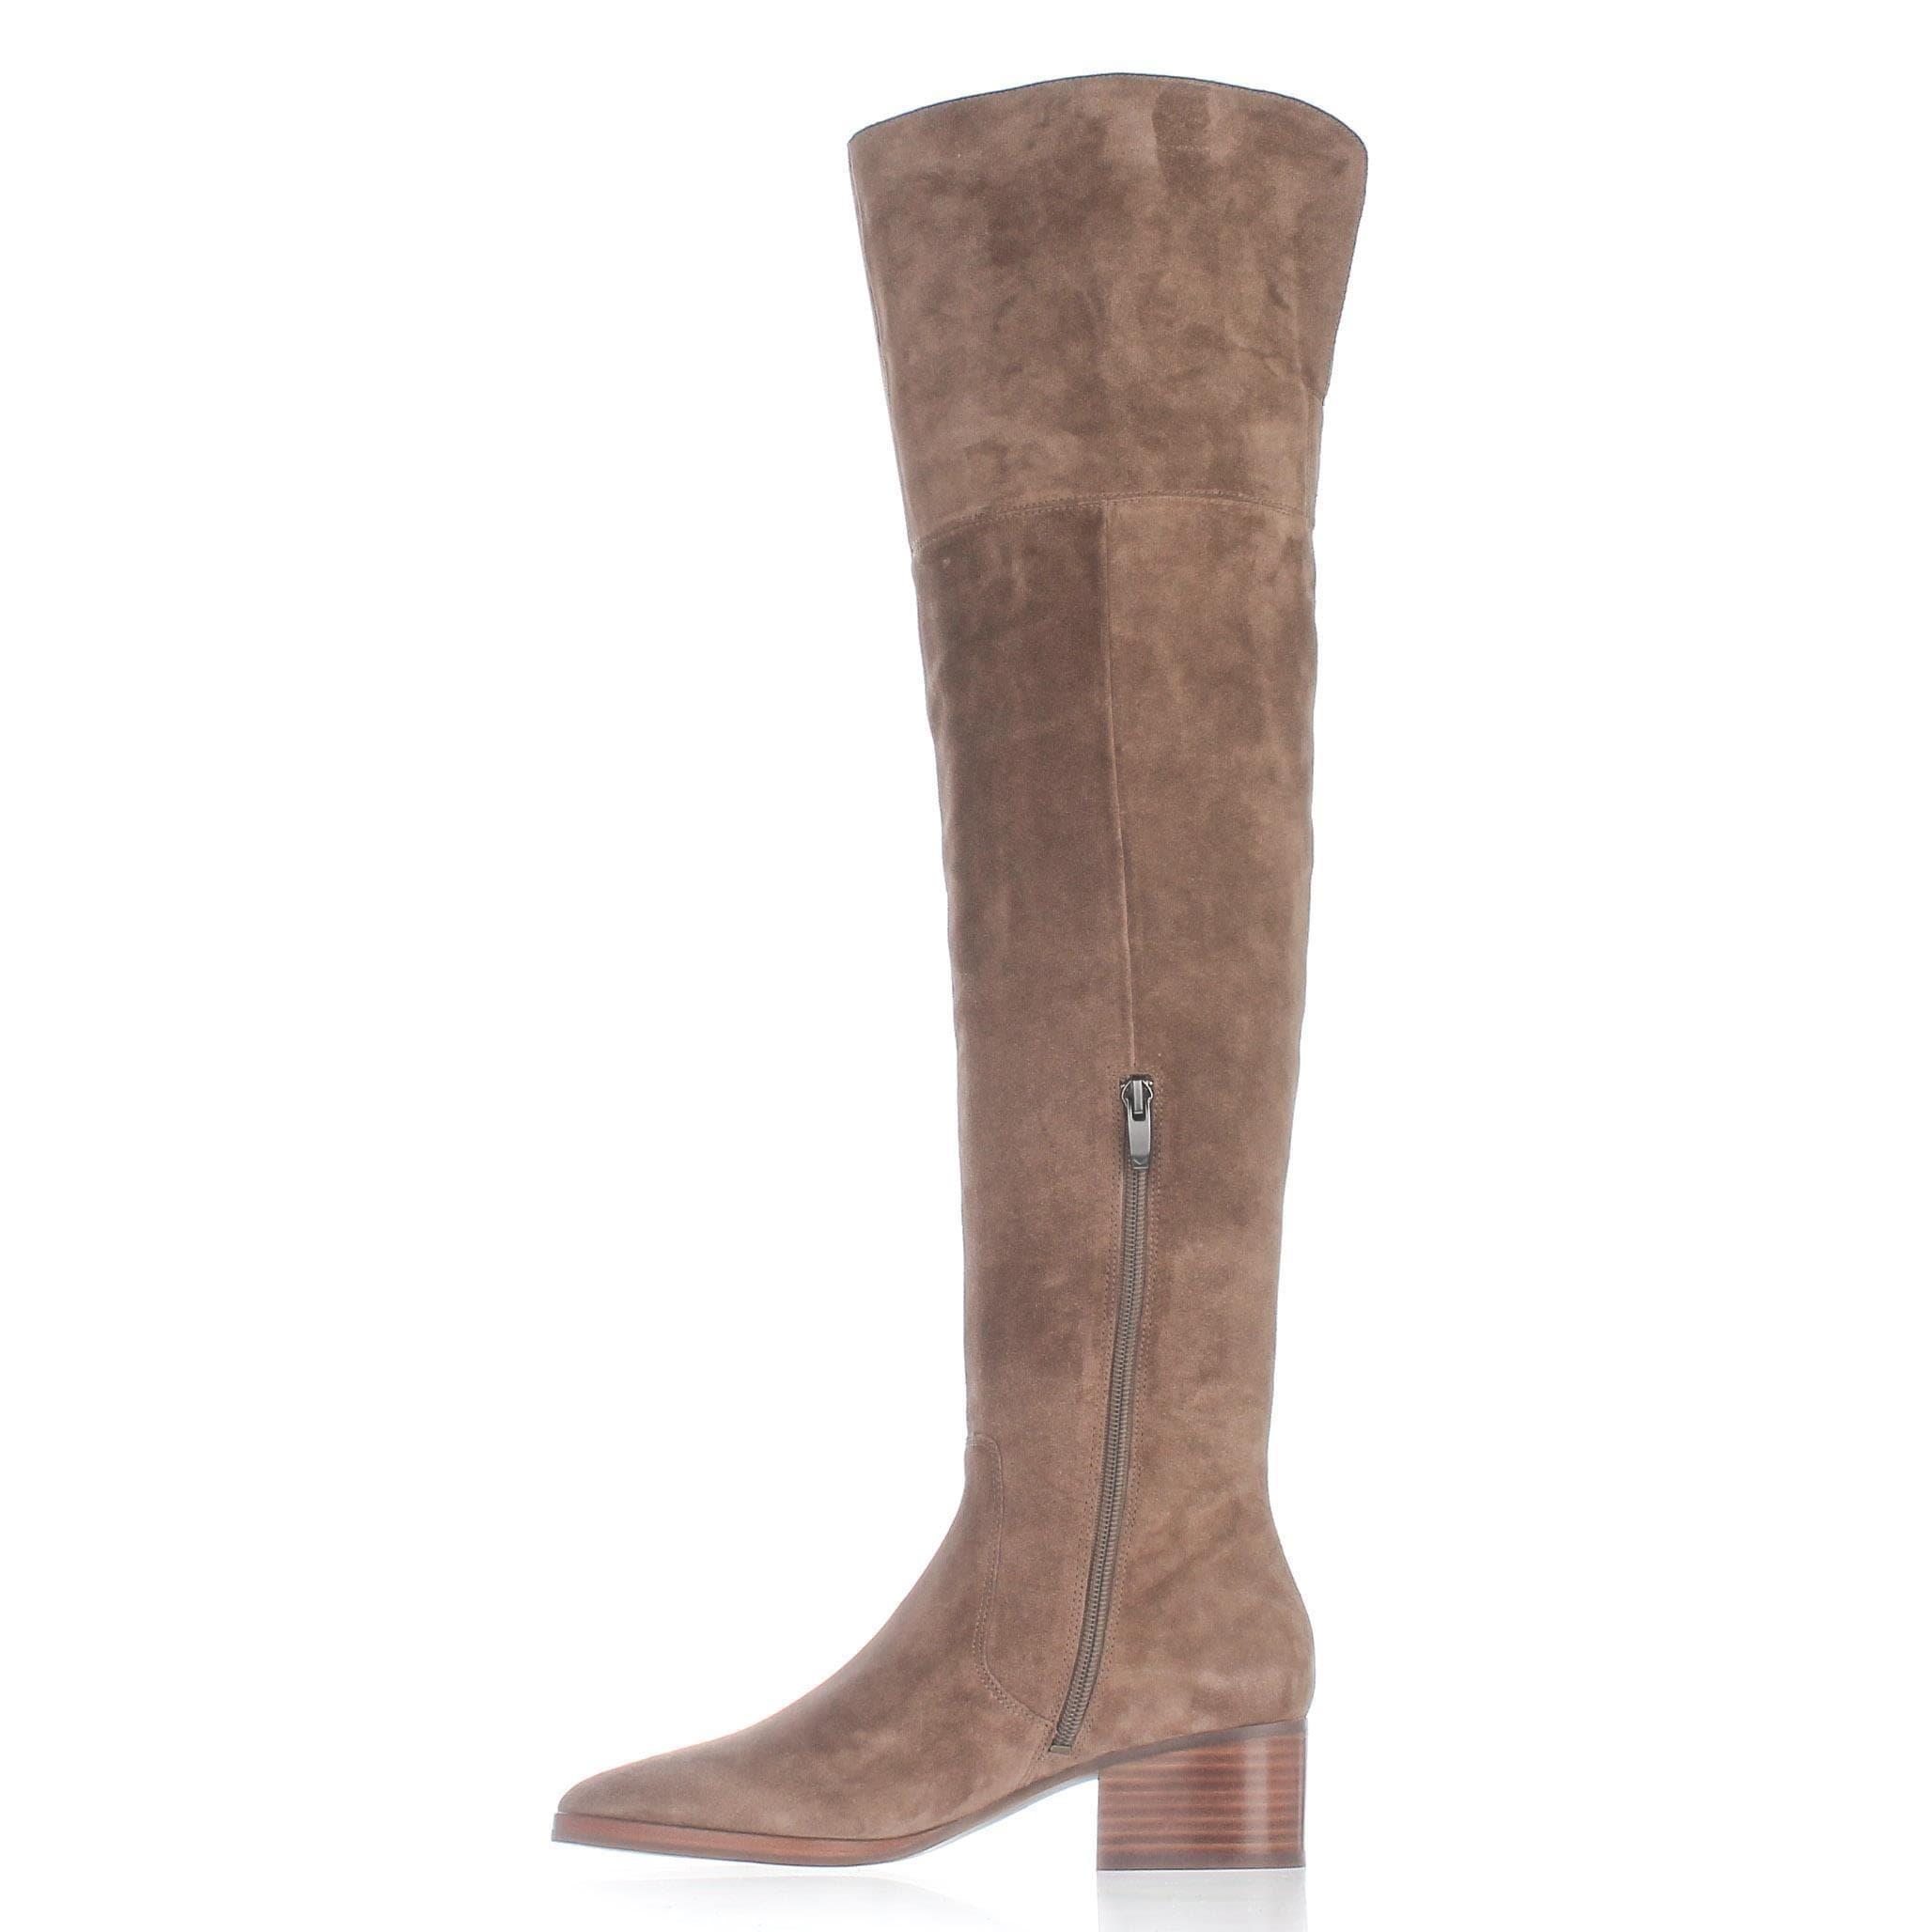 9446326854b Shop Via Spiga Ophira Over-The-Knee Boots